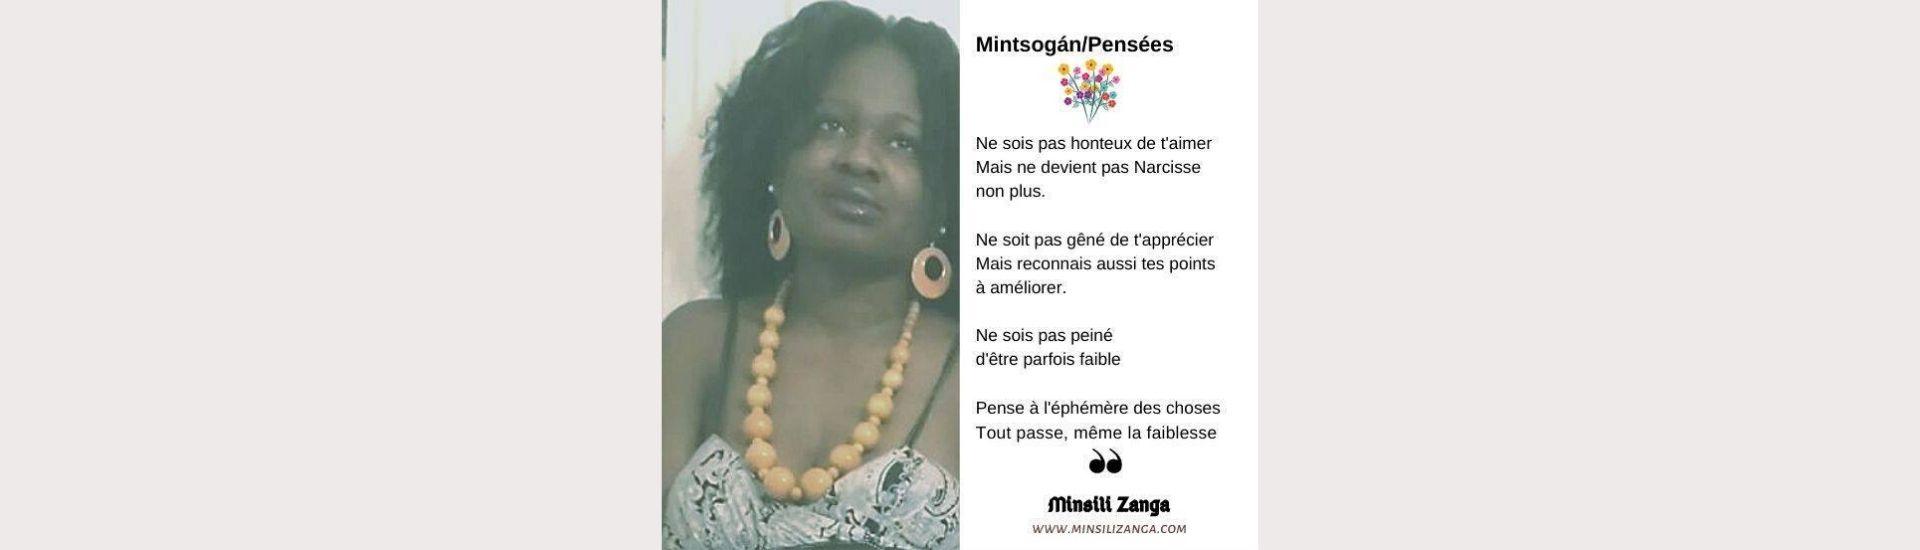 Minsili Zanga Poésie : amour de soi